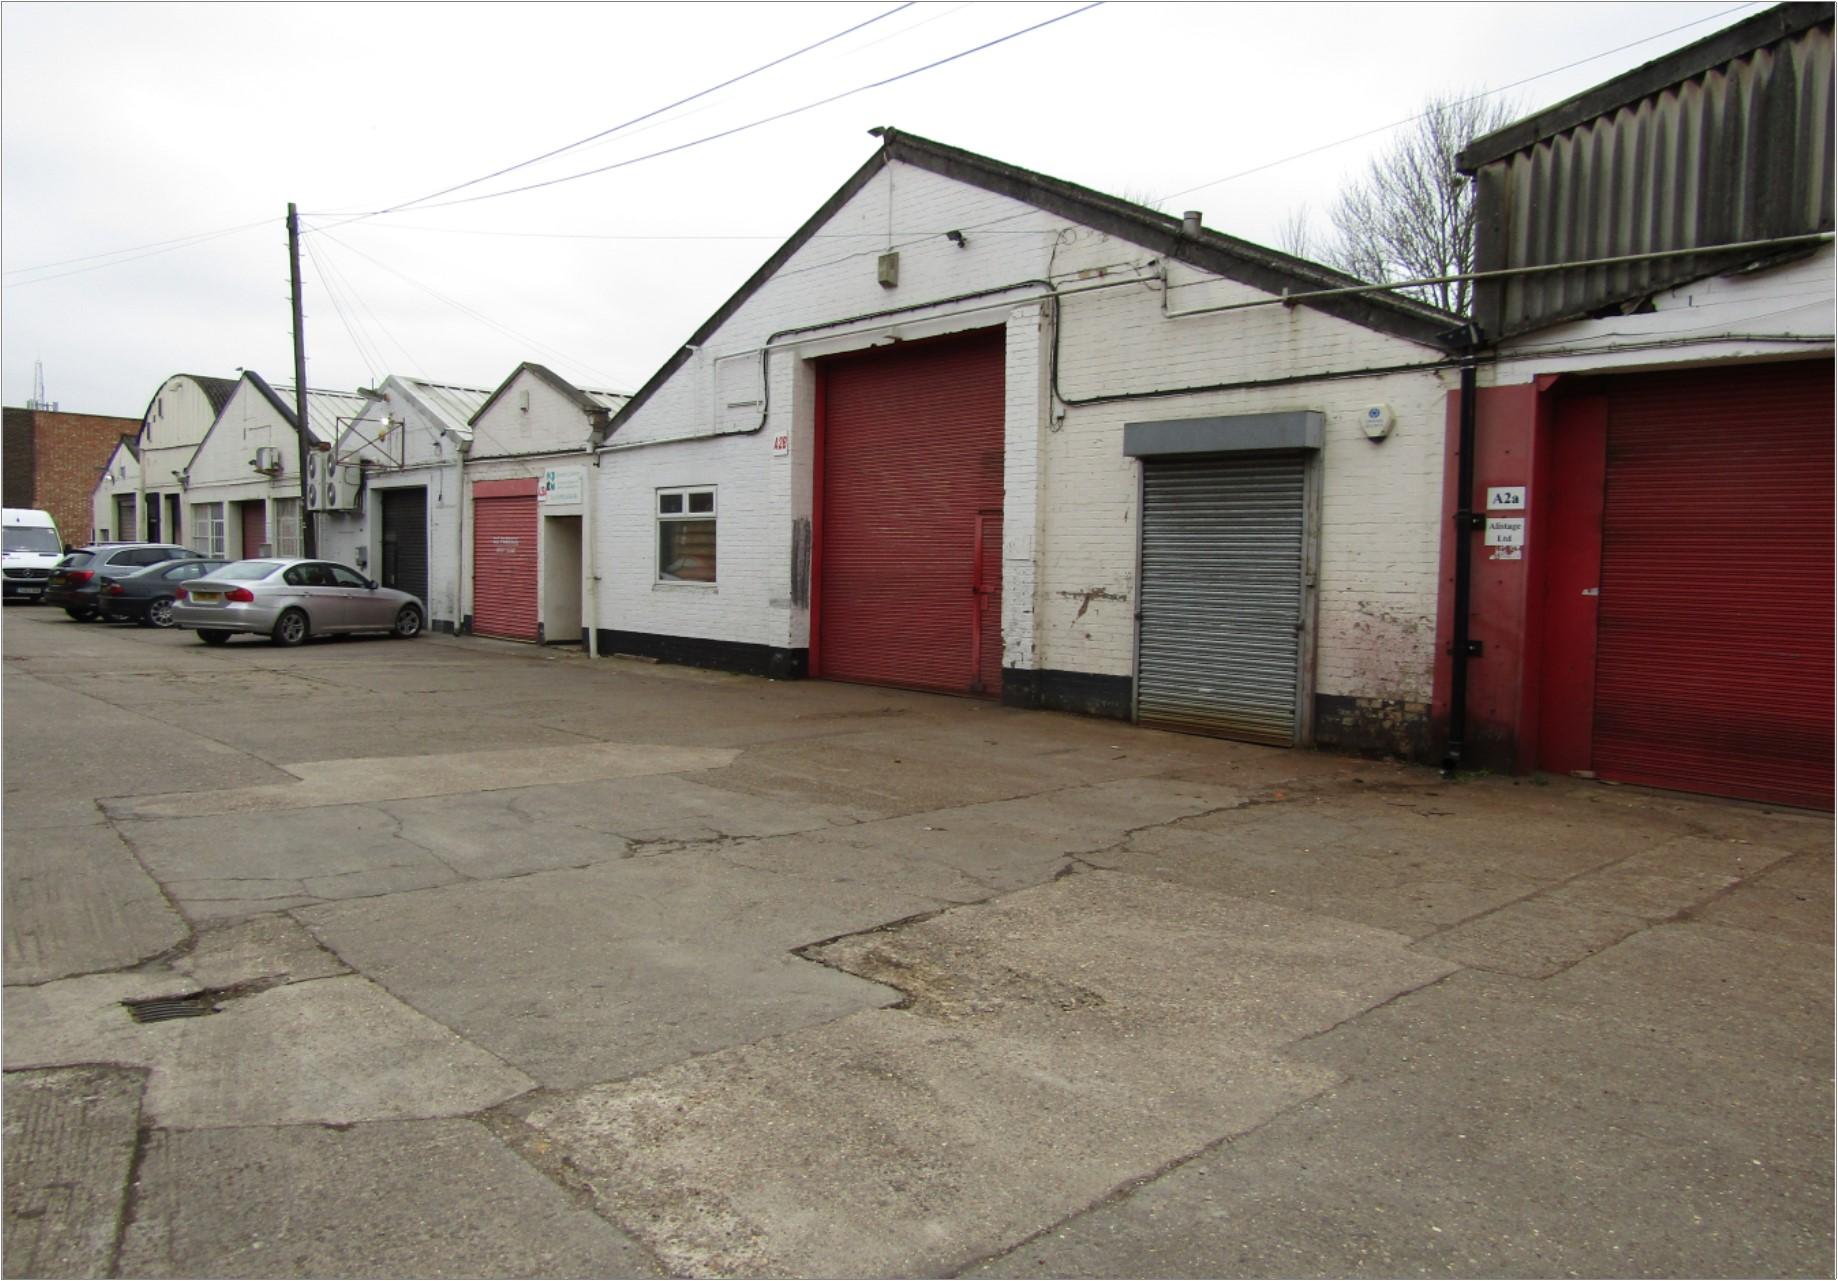 Unit A2B, Lea Road Trading Estate, Lea Road, Waltham Abbey